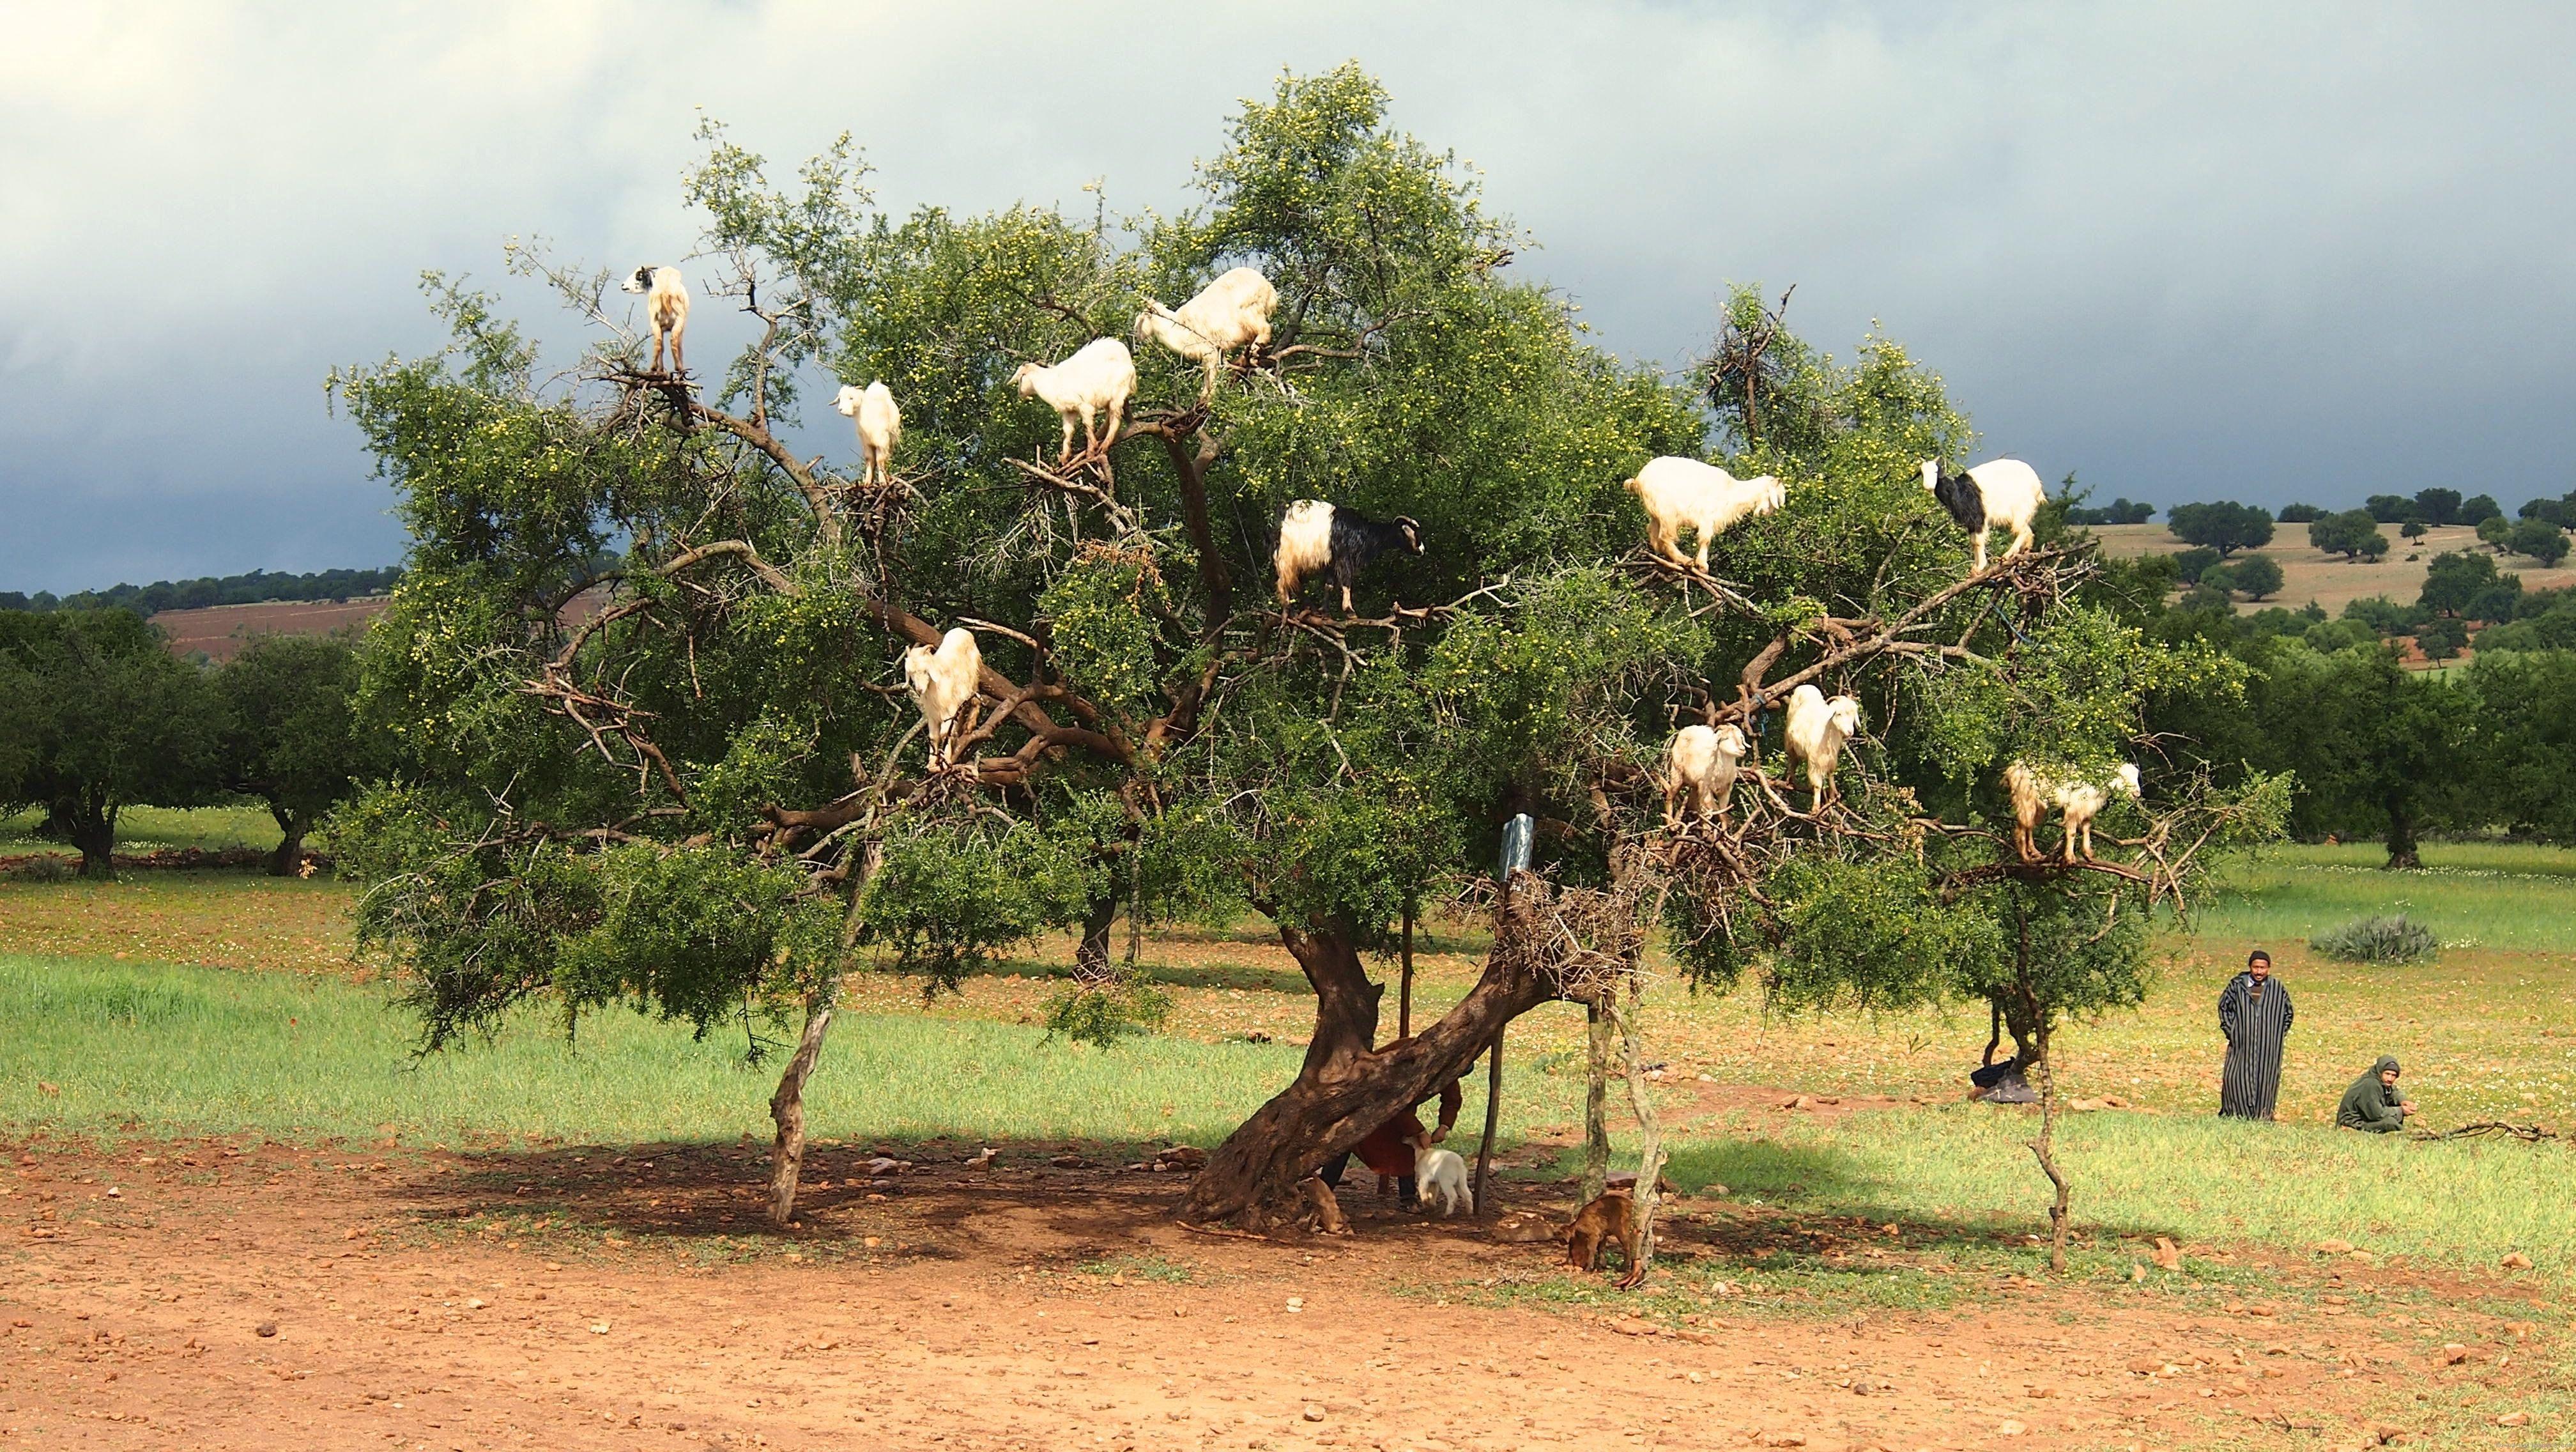 Goats in trees near Essaouira Morocco ...